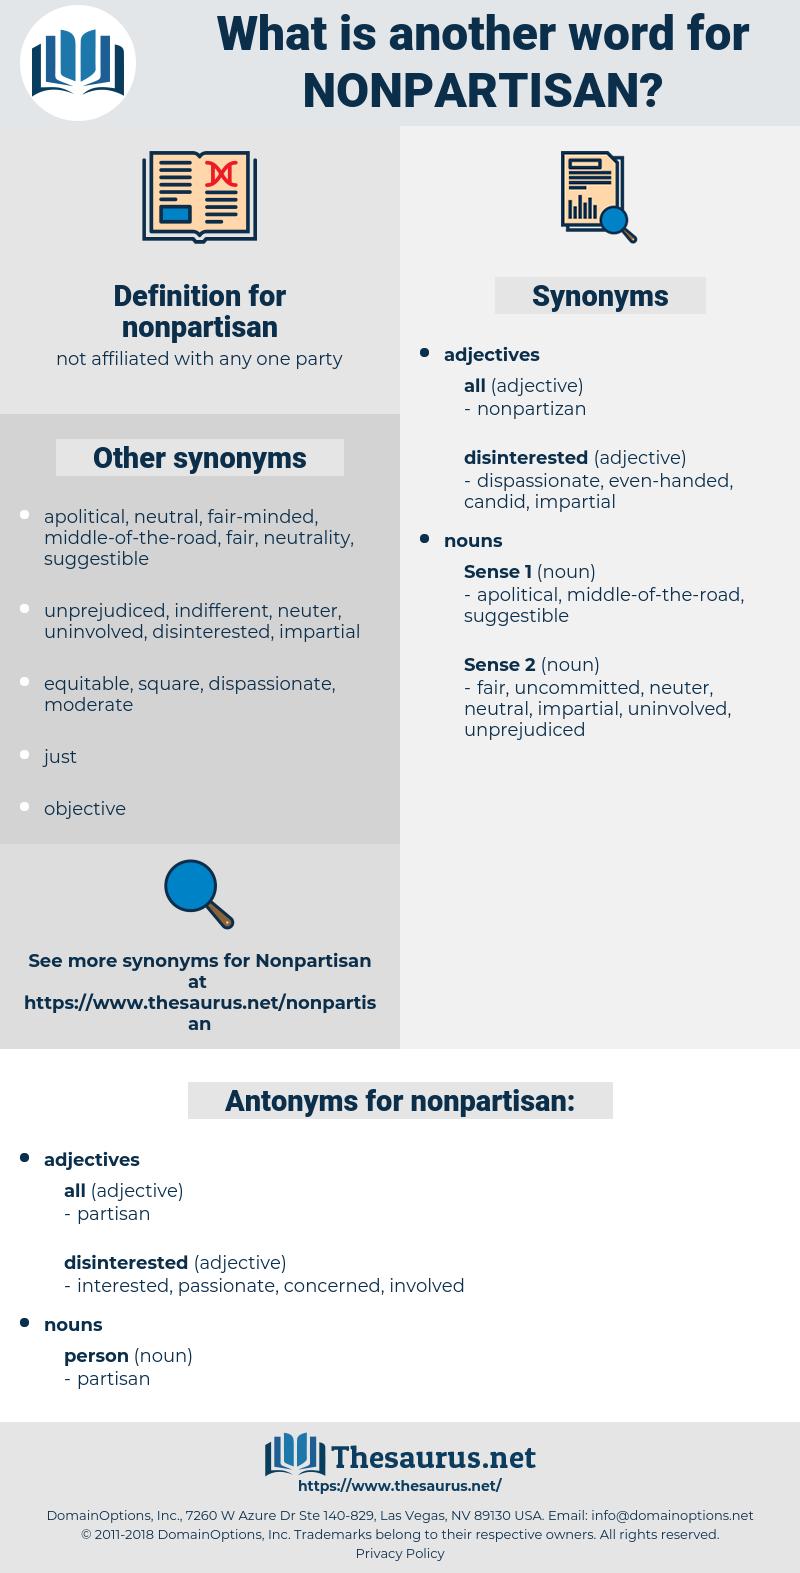 nonpartisan, synonym nonpartisan, another word for nonpartisan, words like nonpartisan, thesaurus nonpartisan